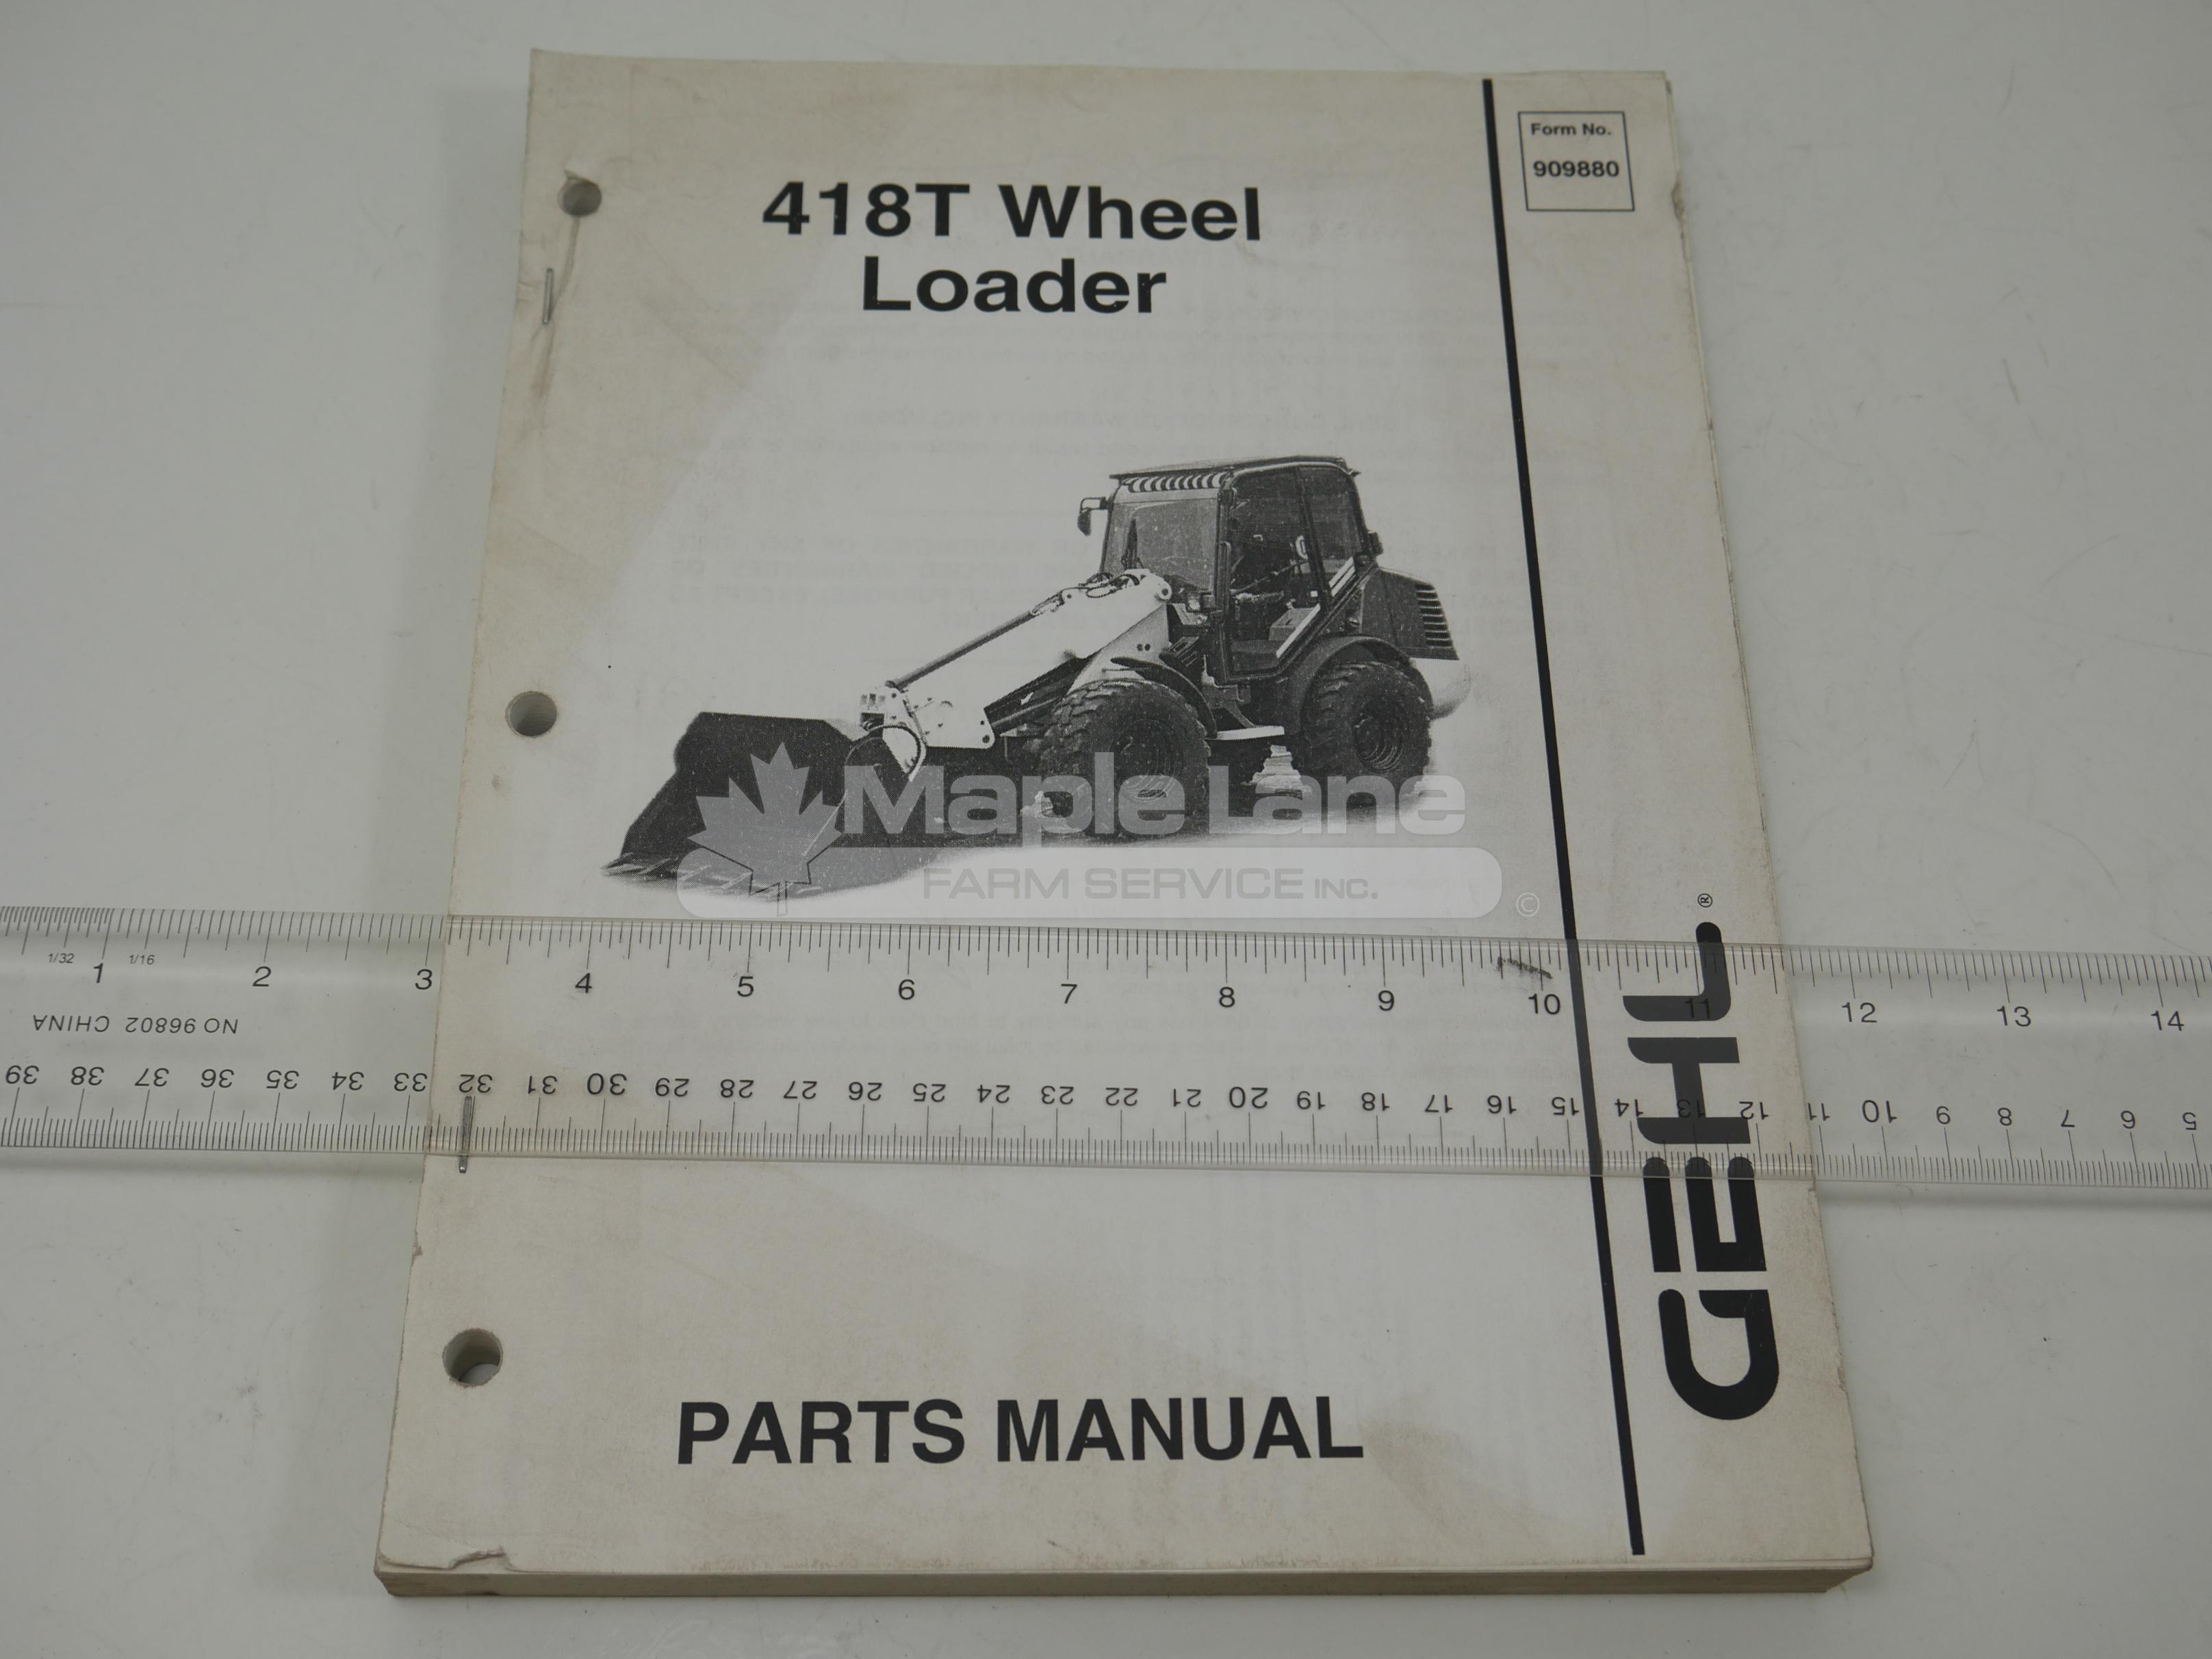 909880 Parts Manual